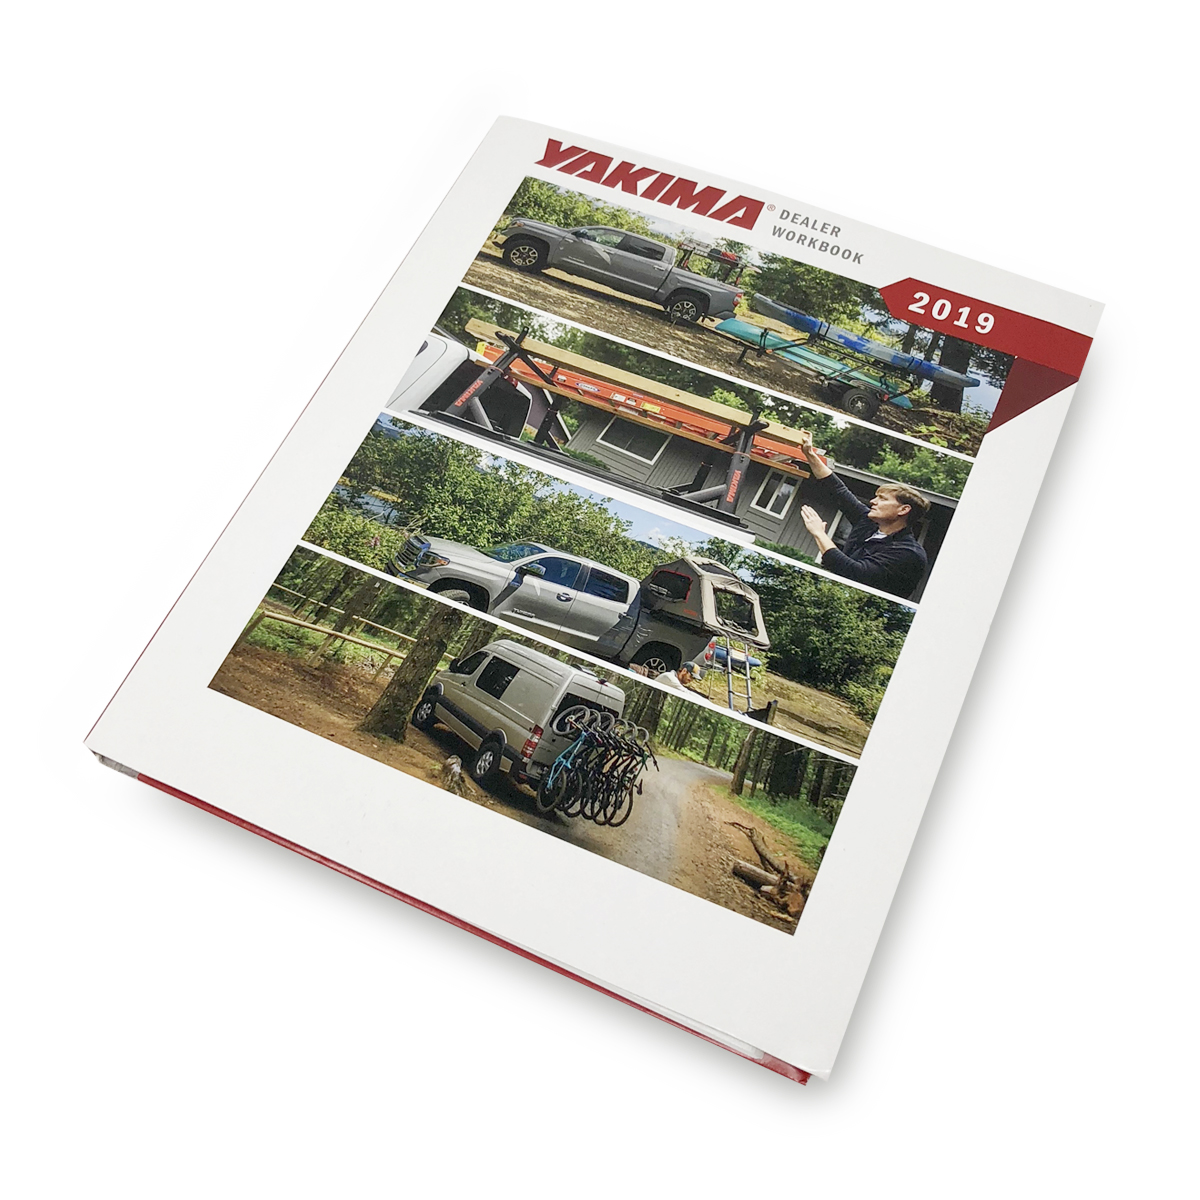 DealerWorkBook-Cover.jpg